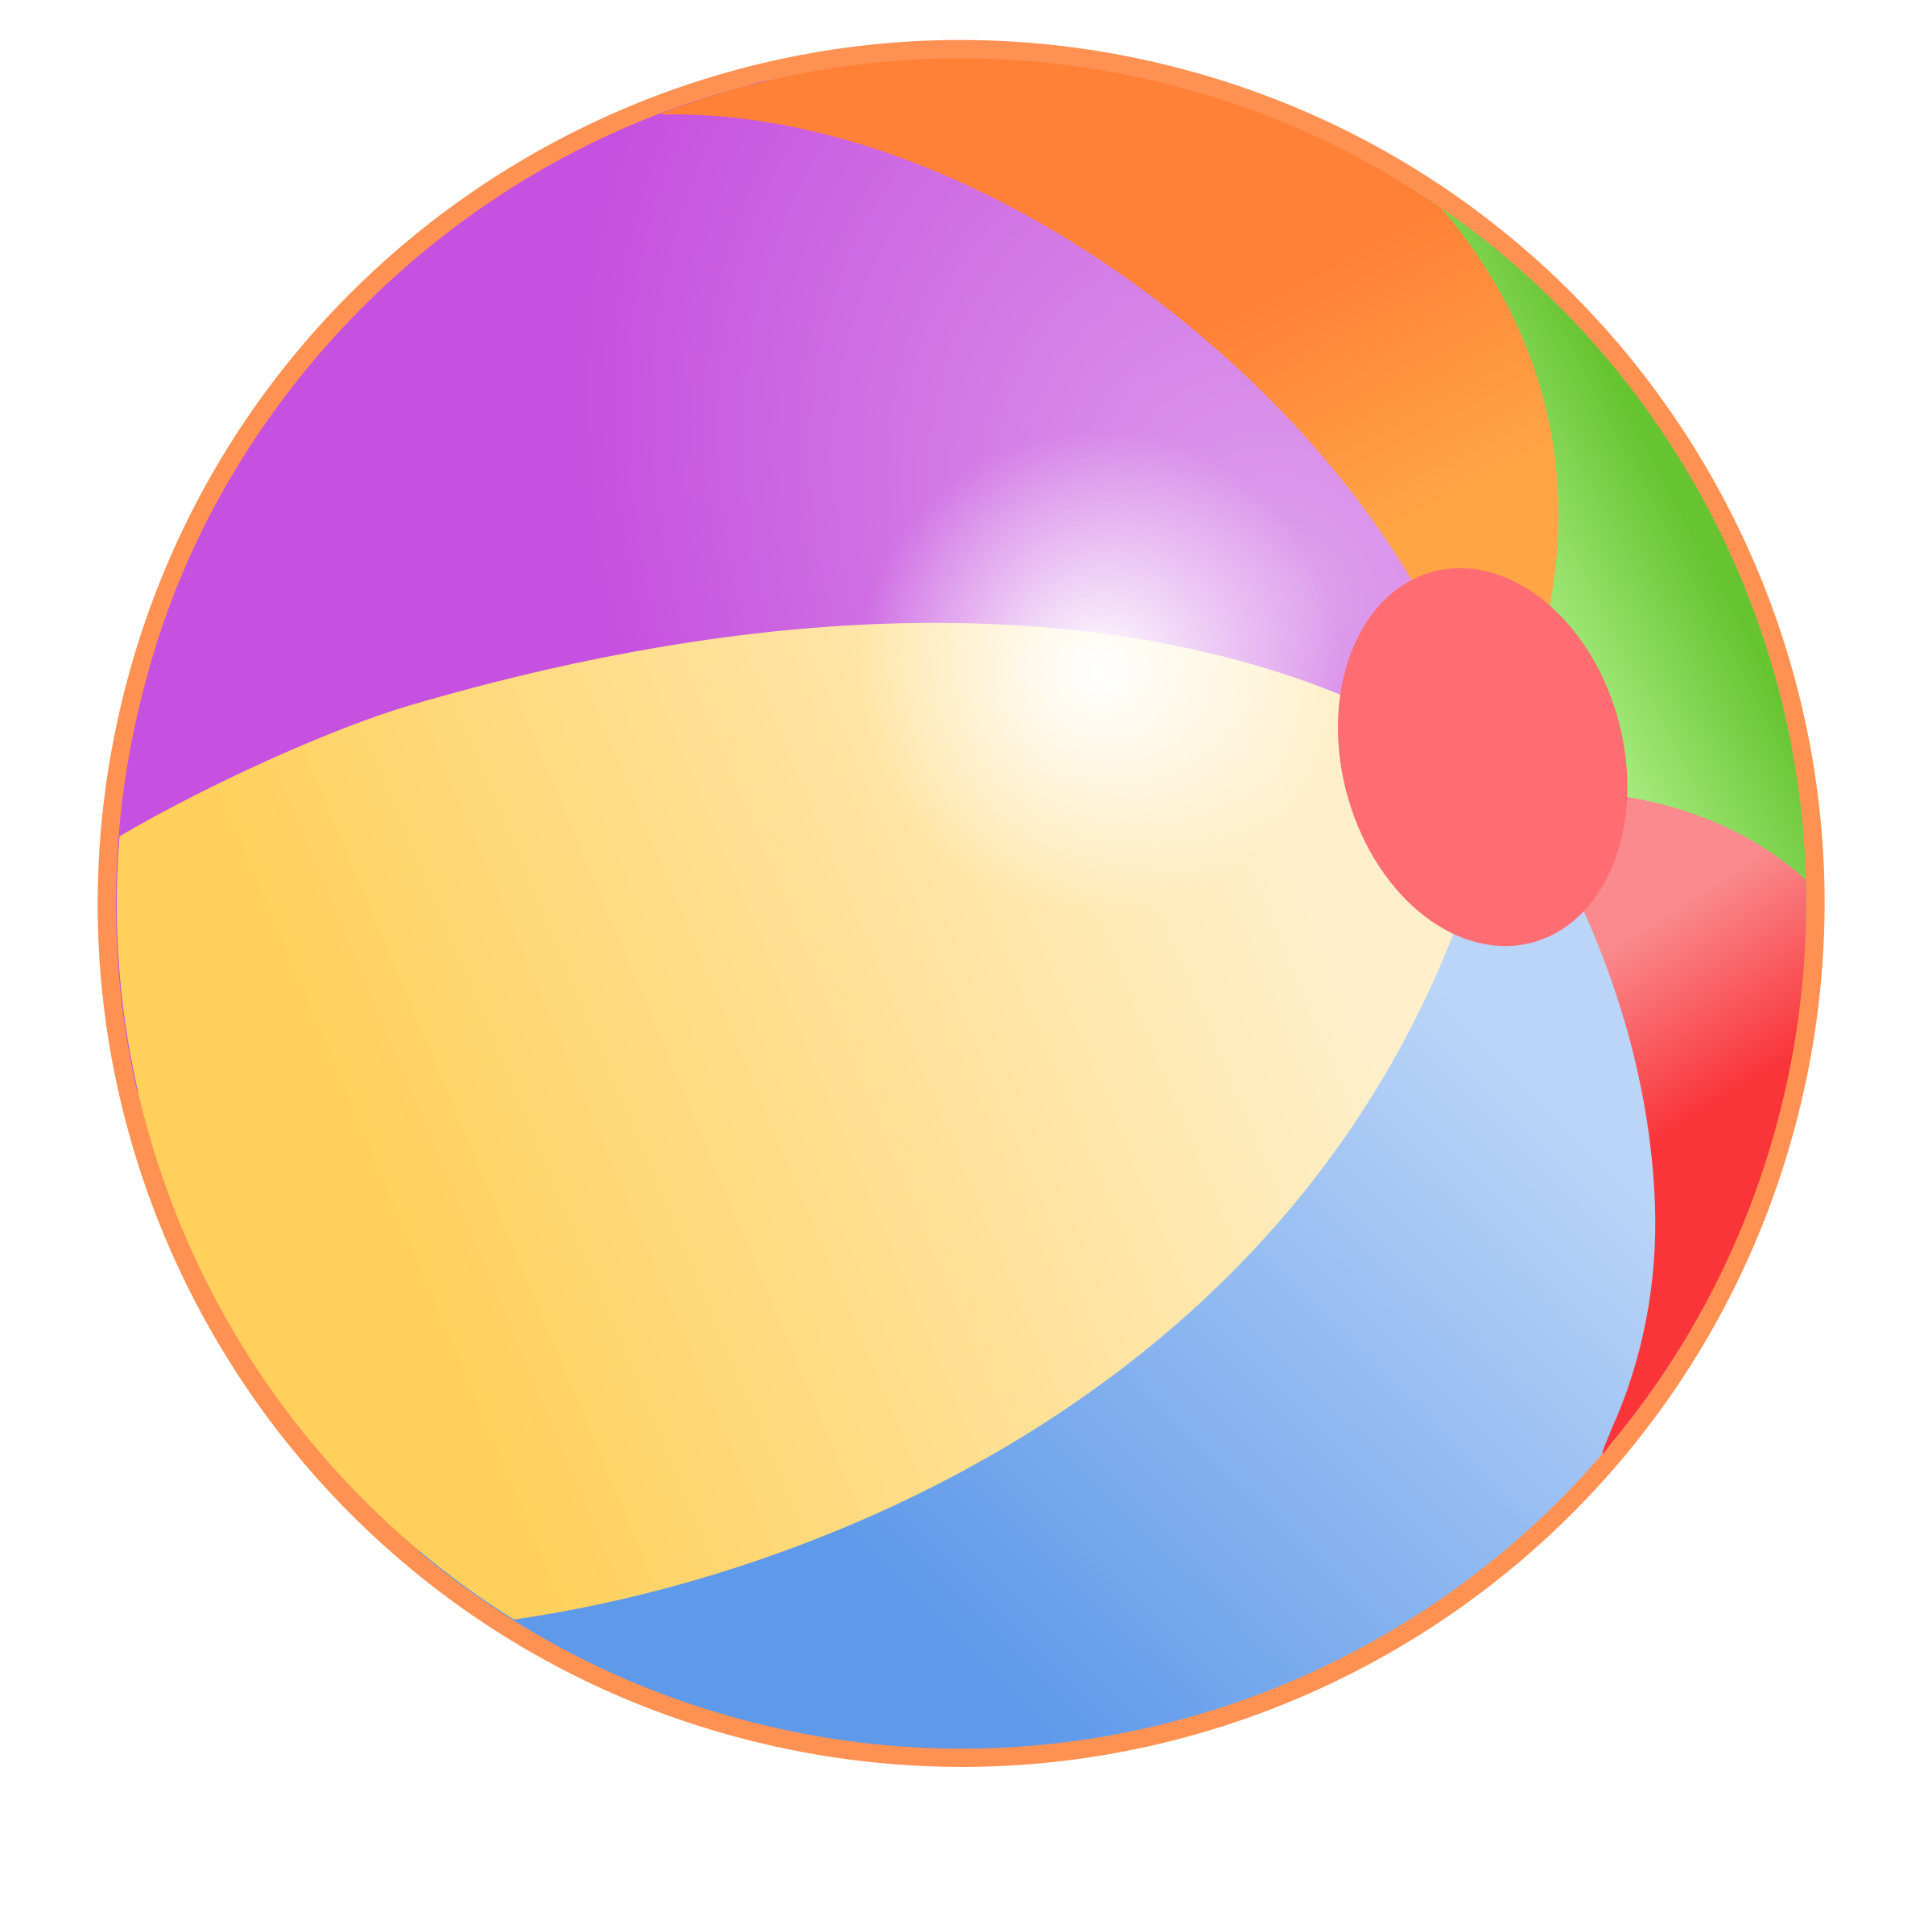 Beachball clipart transparent background. Beach ball png images